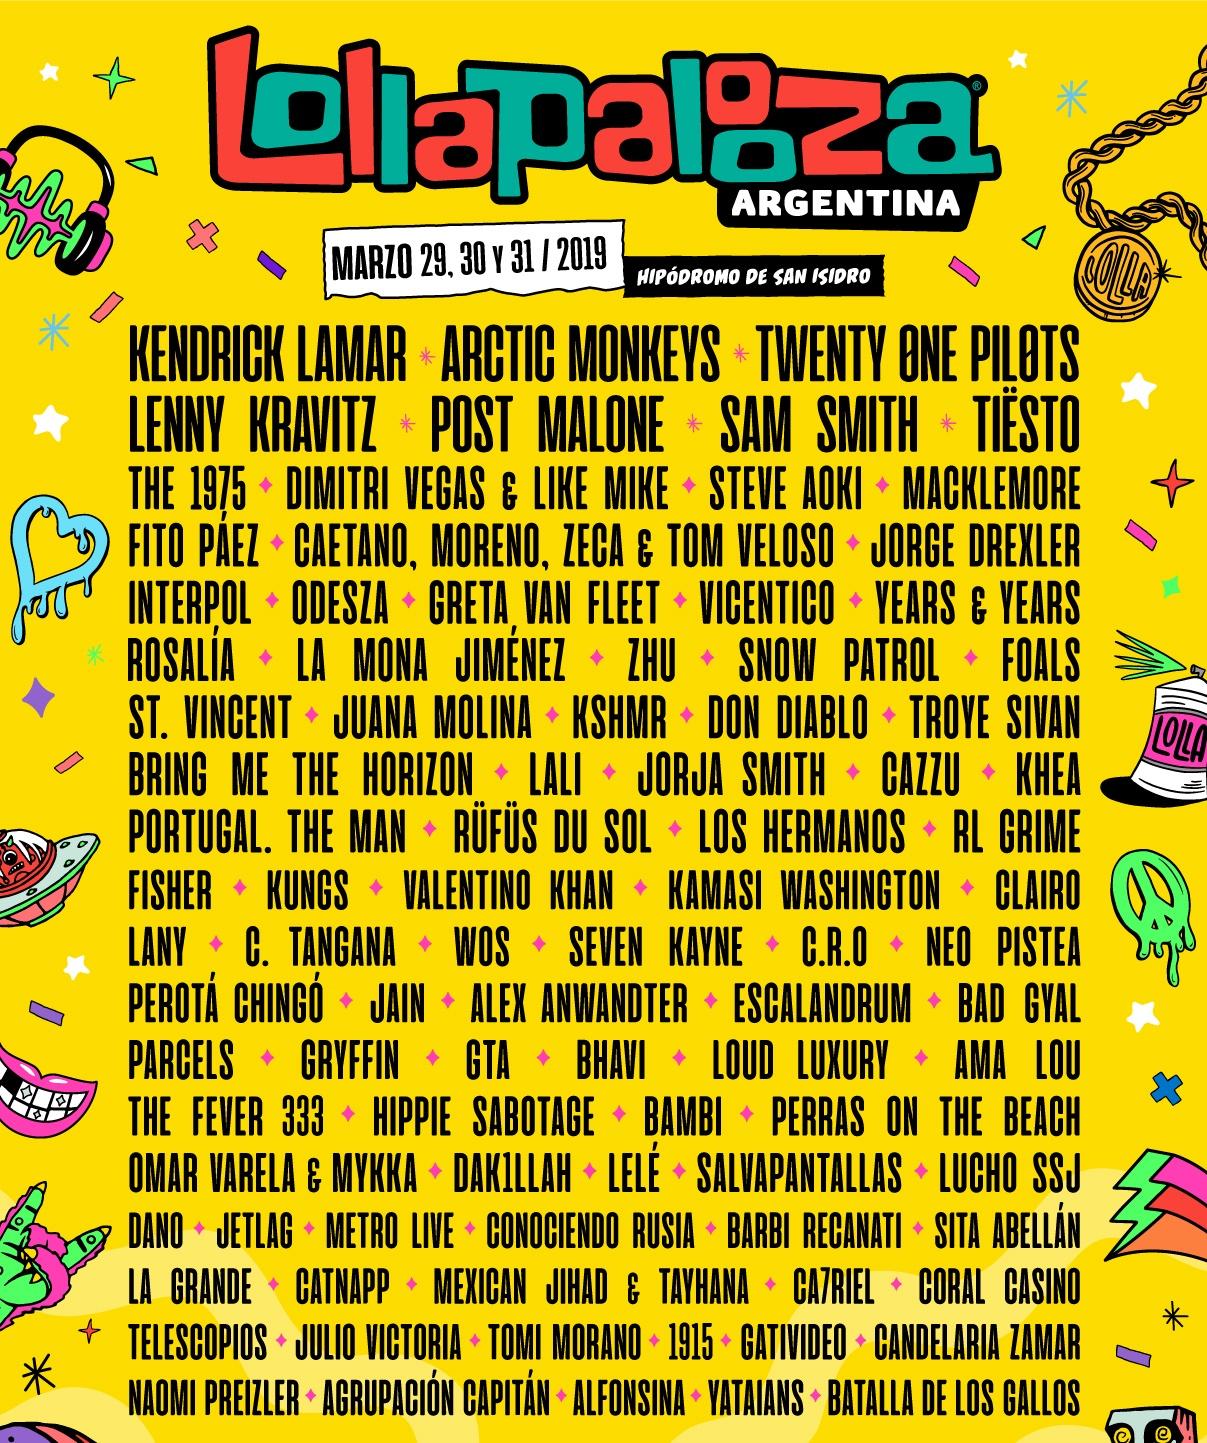 Cartaz do Lollapalooza Argentina 2019